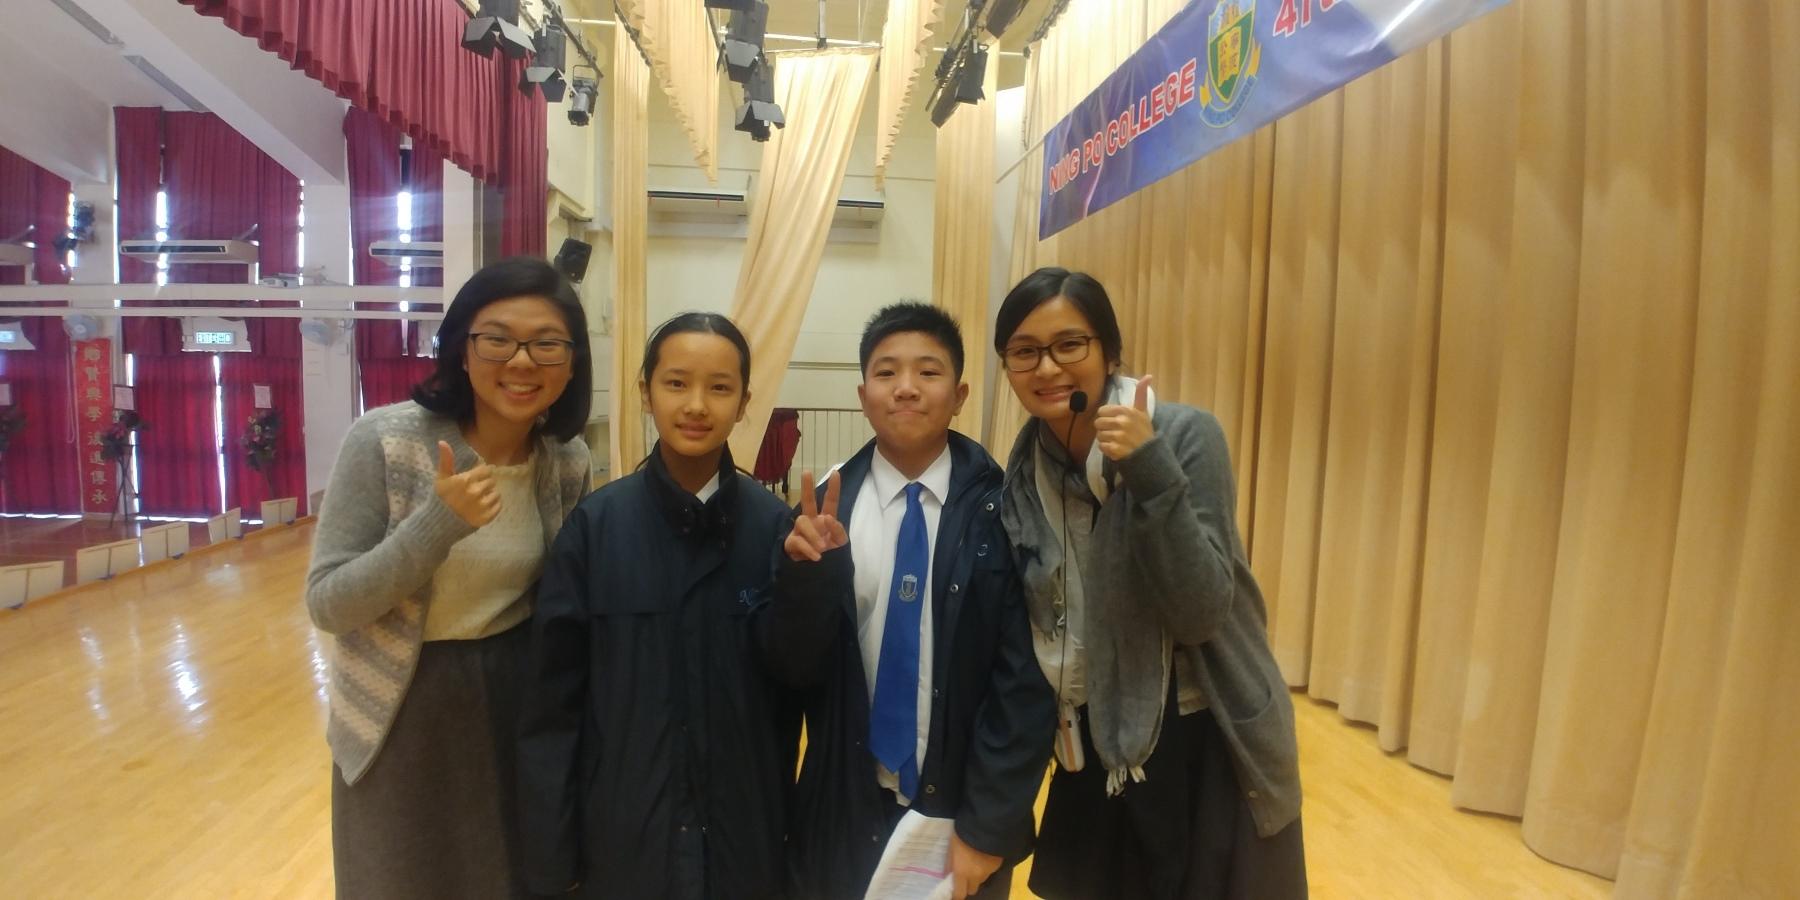 http://npc.edu.hk/sites/default/files/20190122_130938.jpg